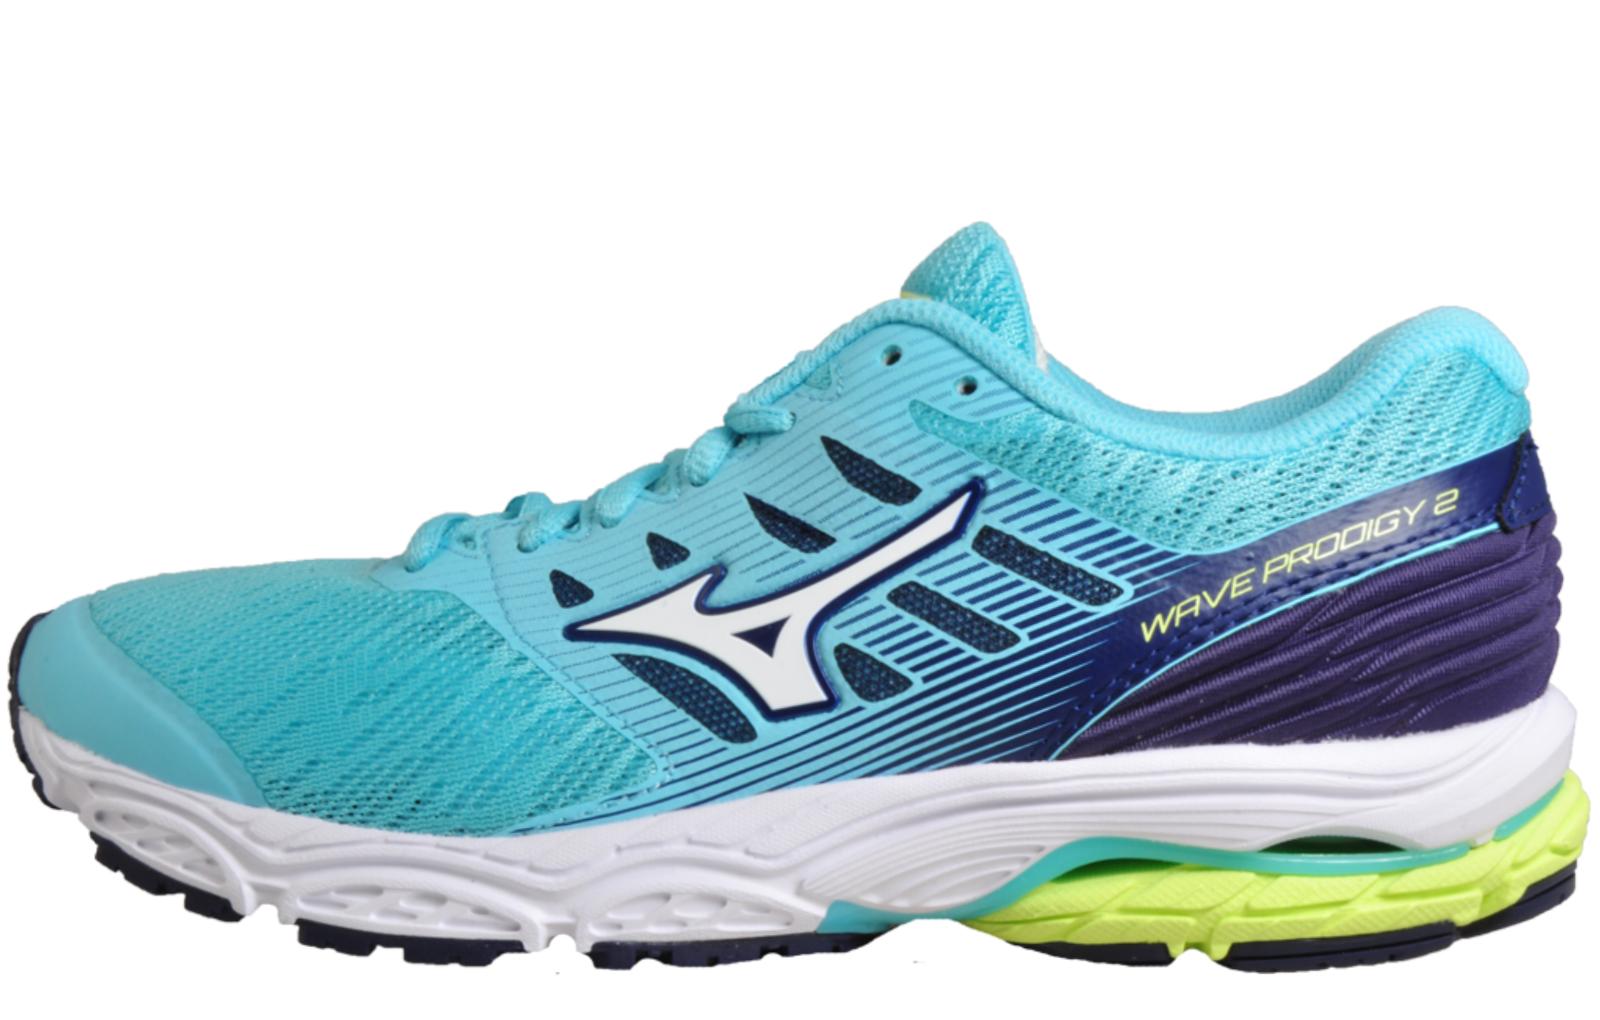 hot sale online 48b72 7acfb Mizuno Trainers Sale | Cheap Mizuno Running Shoes | Express ...